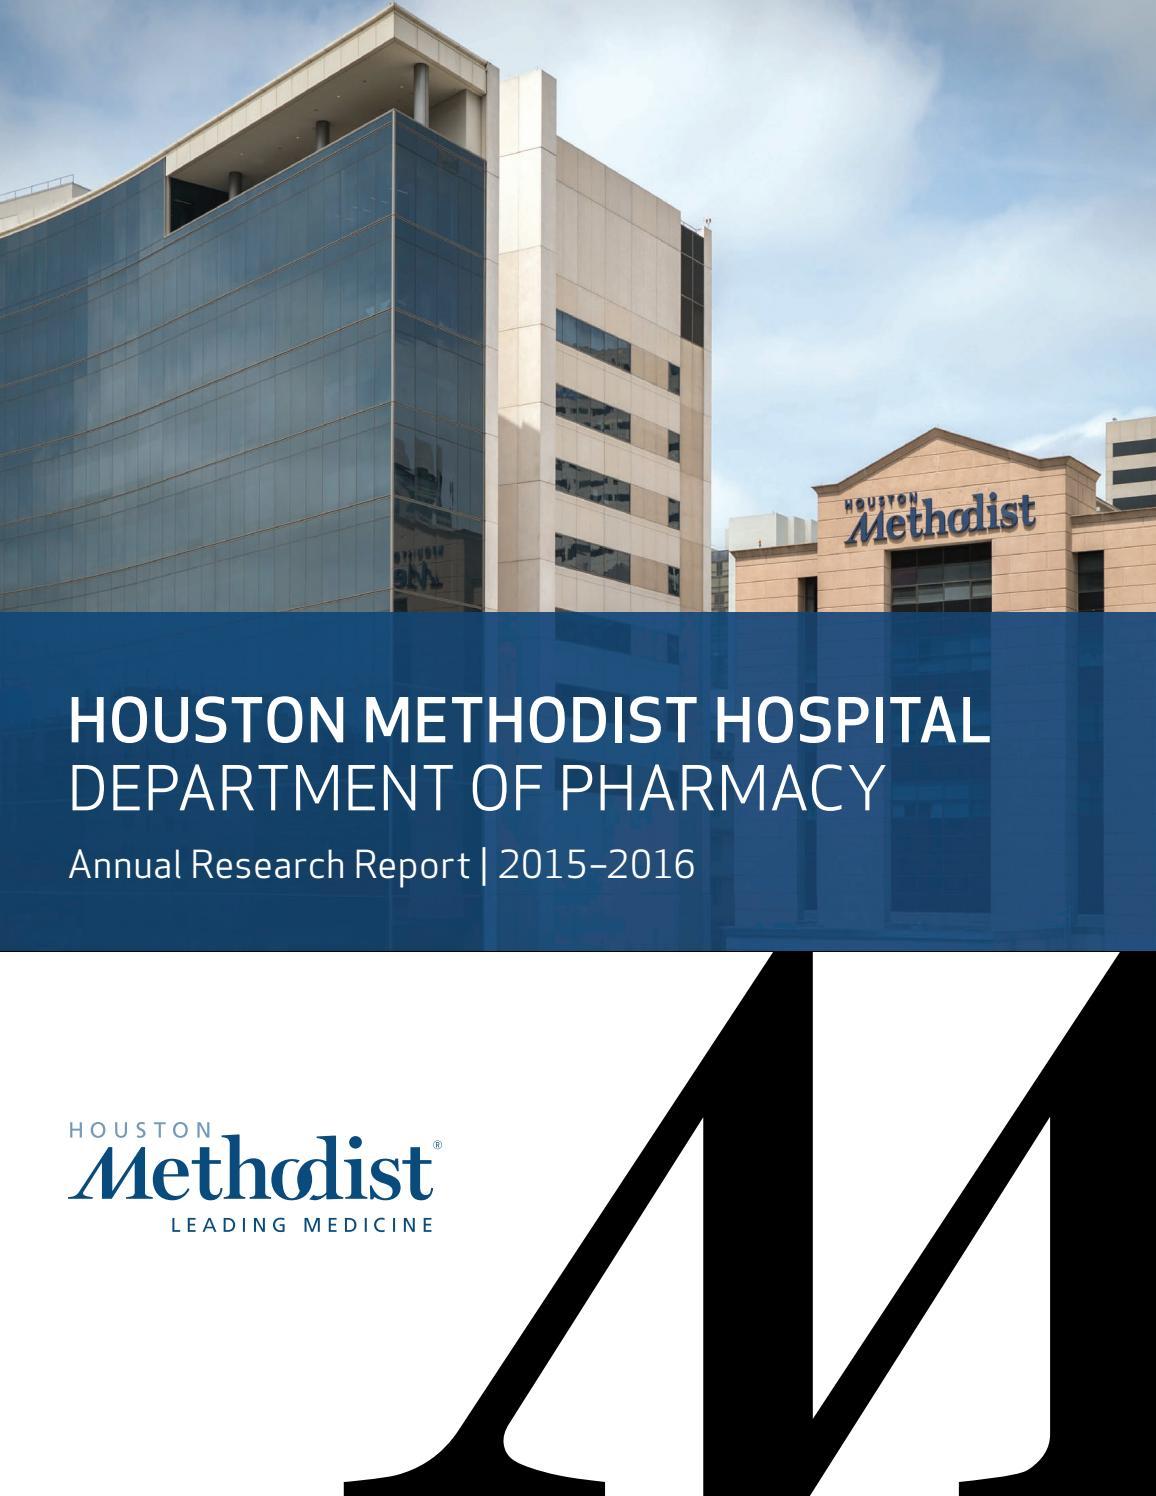 Houston Methodist Hospital Department of Pharmacy Annual